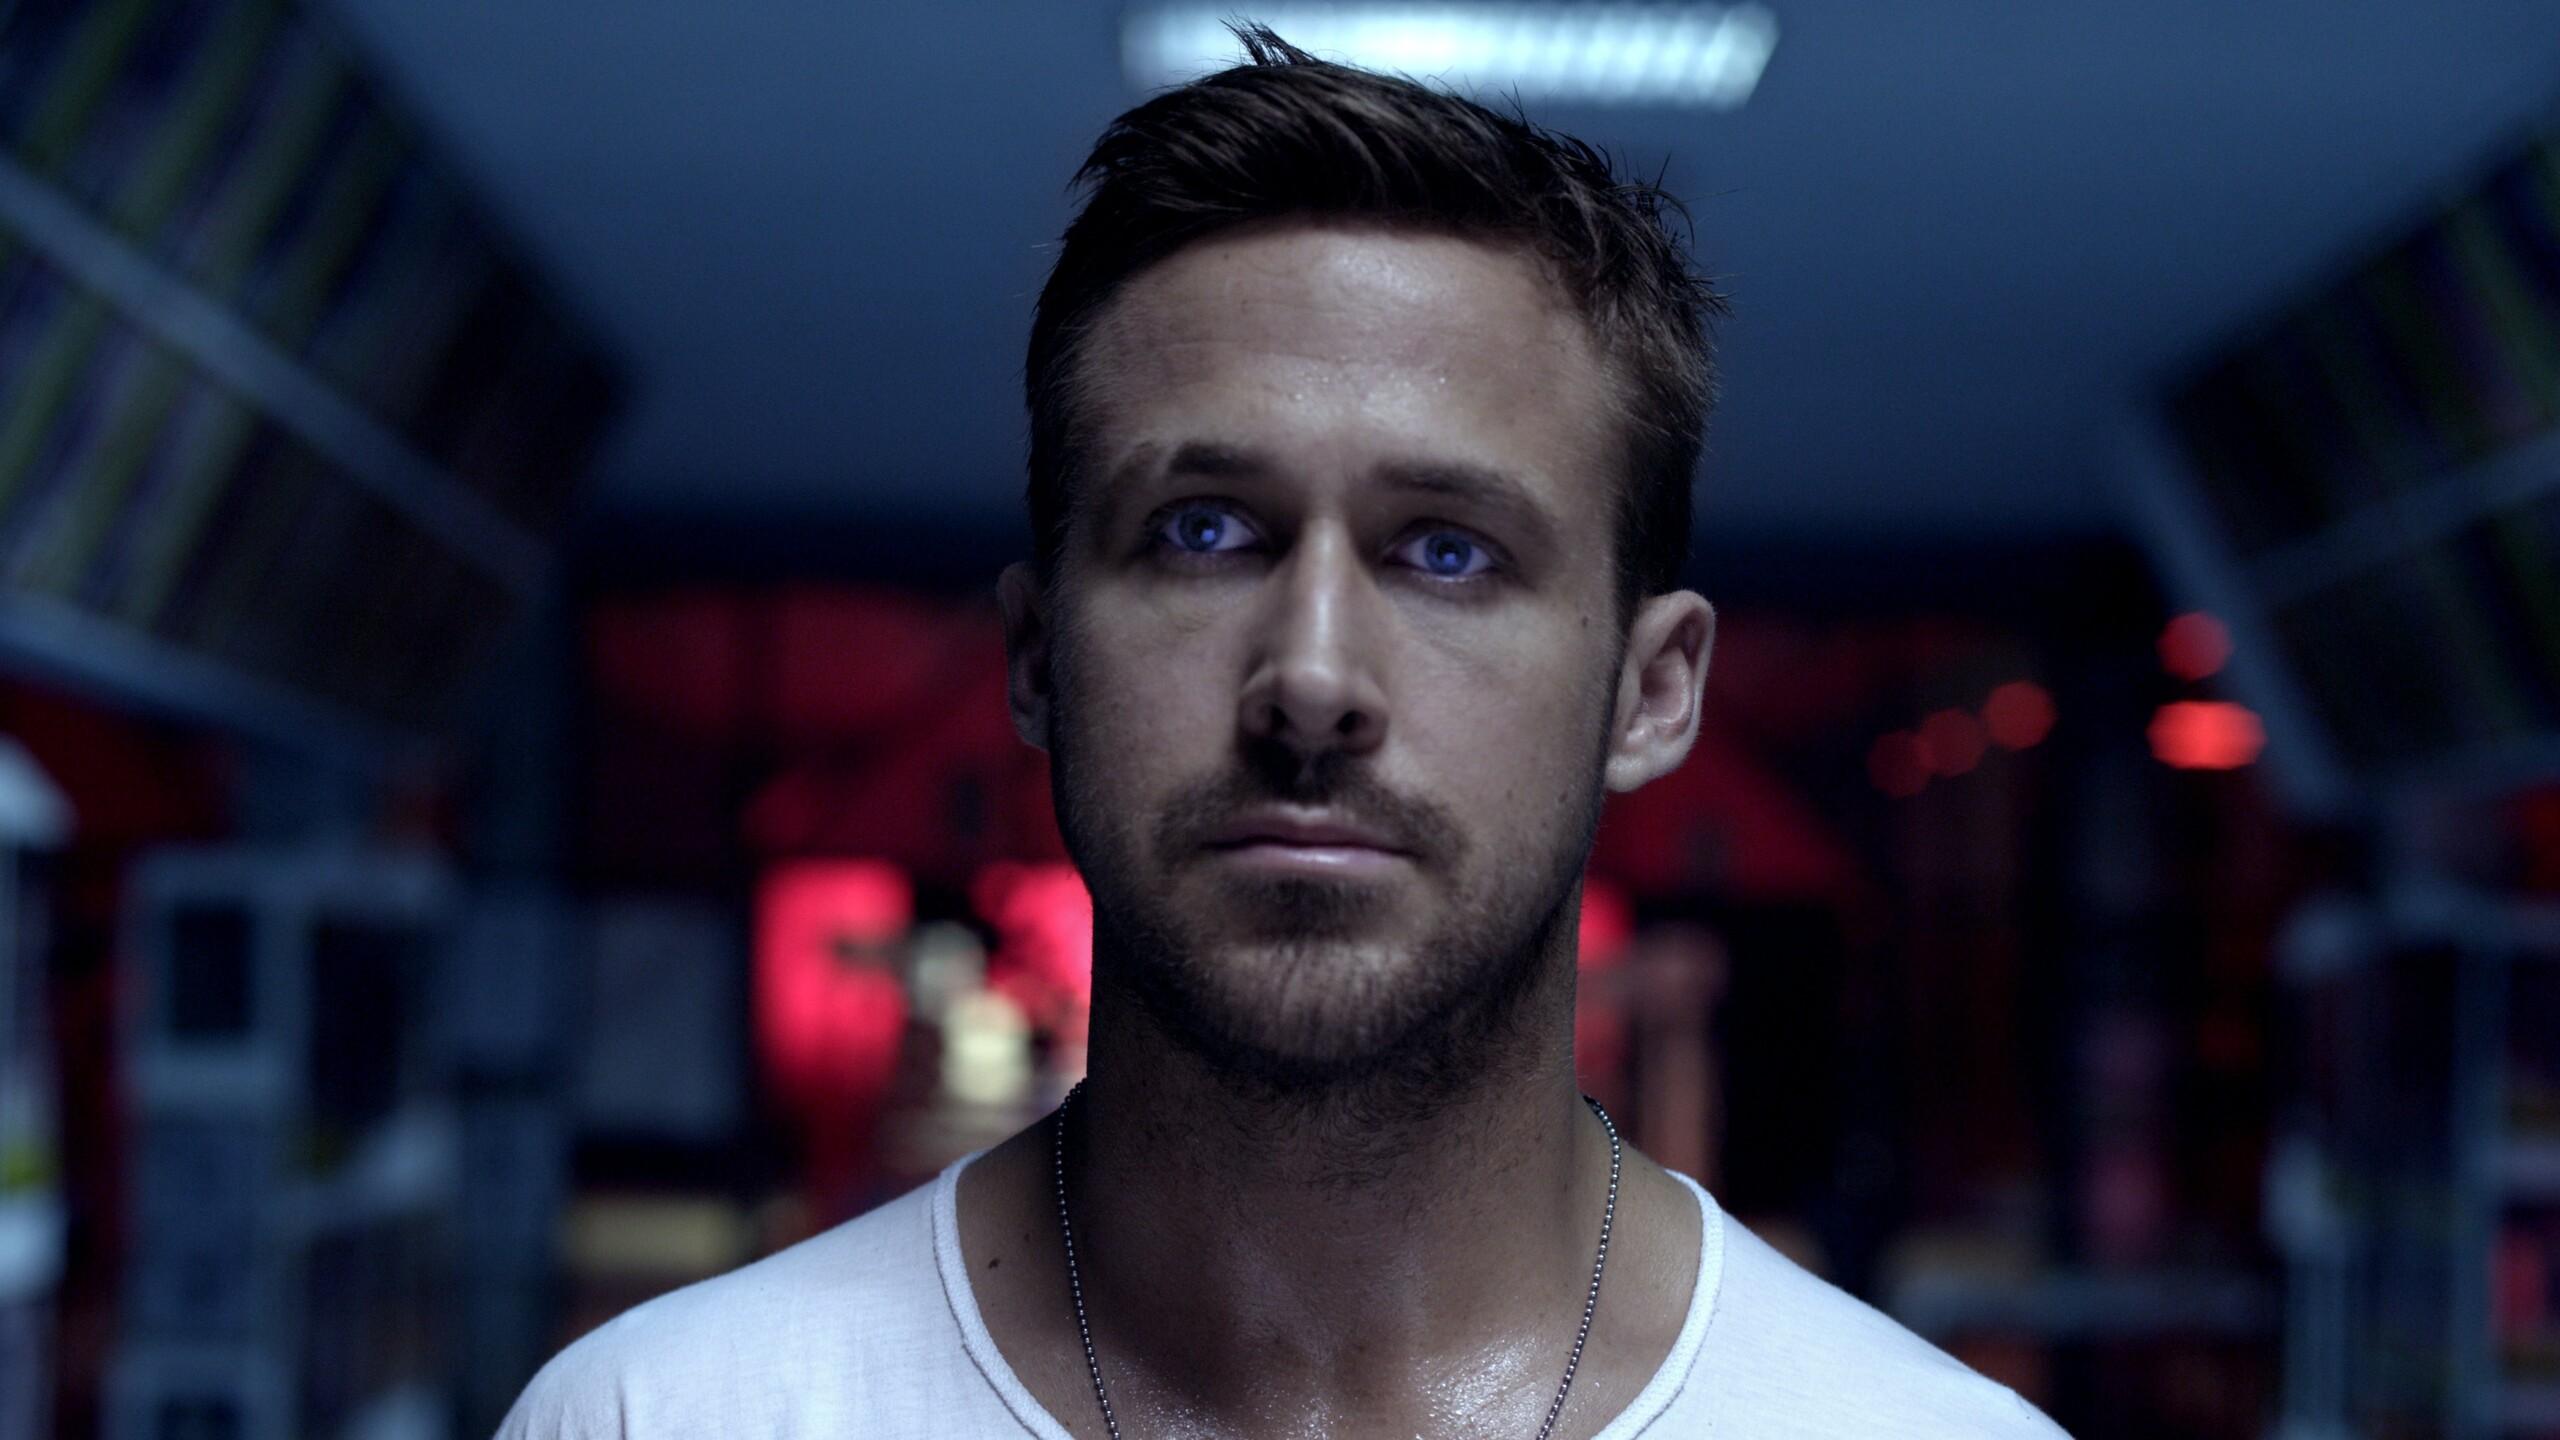 ryan-gosling-wallpaper.jpg